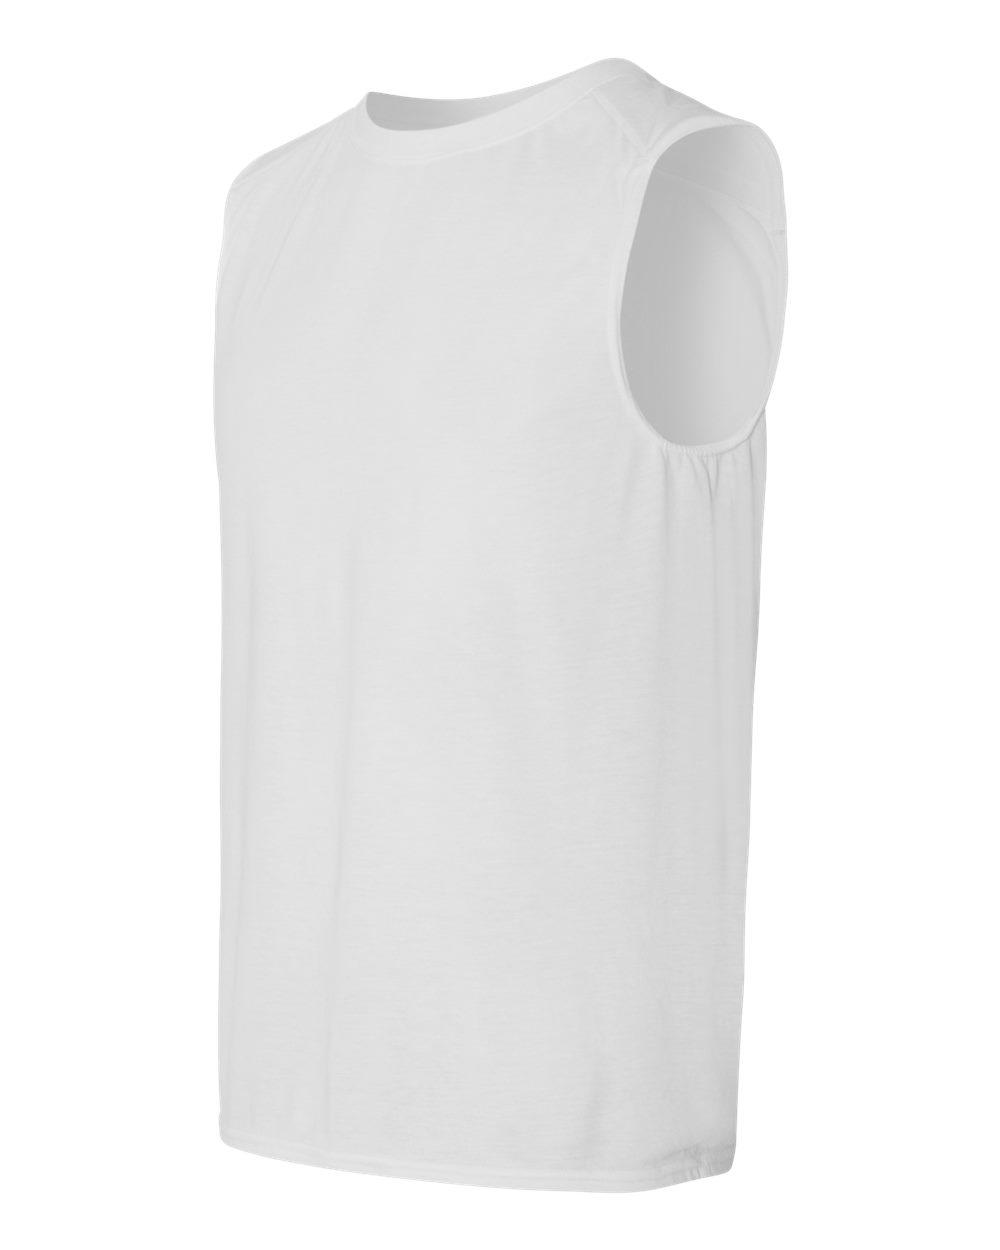 Gildan 42700 - Performance Sleeveless T-Shirt